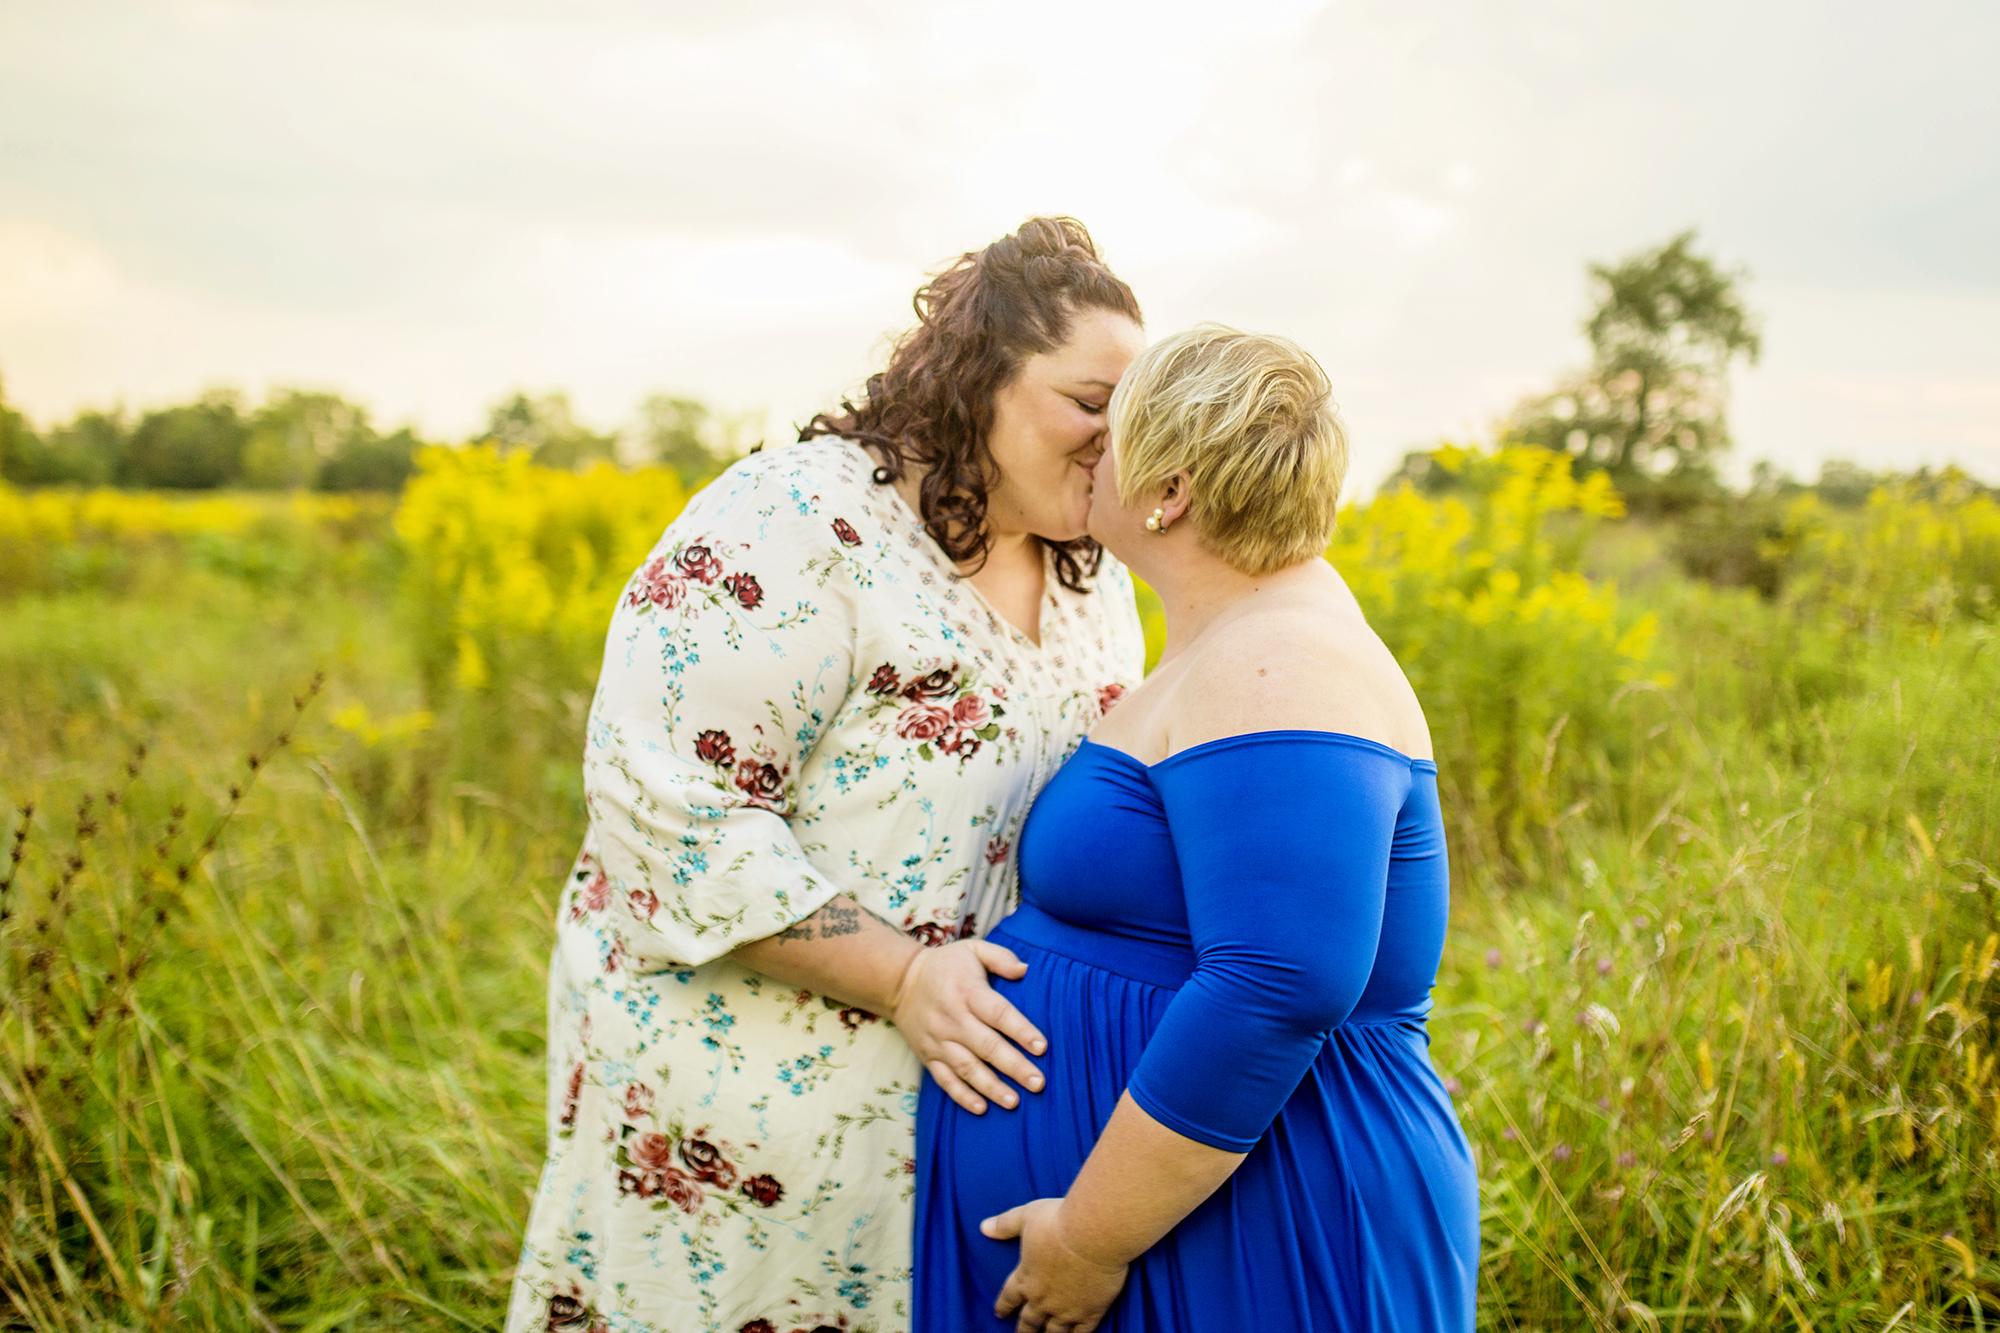 Seriously_Sabrina_Photography_Lexington_Kentucky_Maternity_Portraits_Hisle_Farm_JC12.jpg